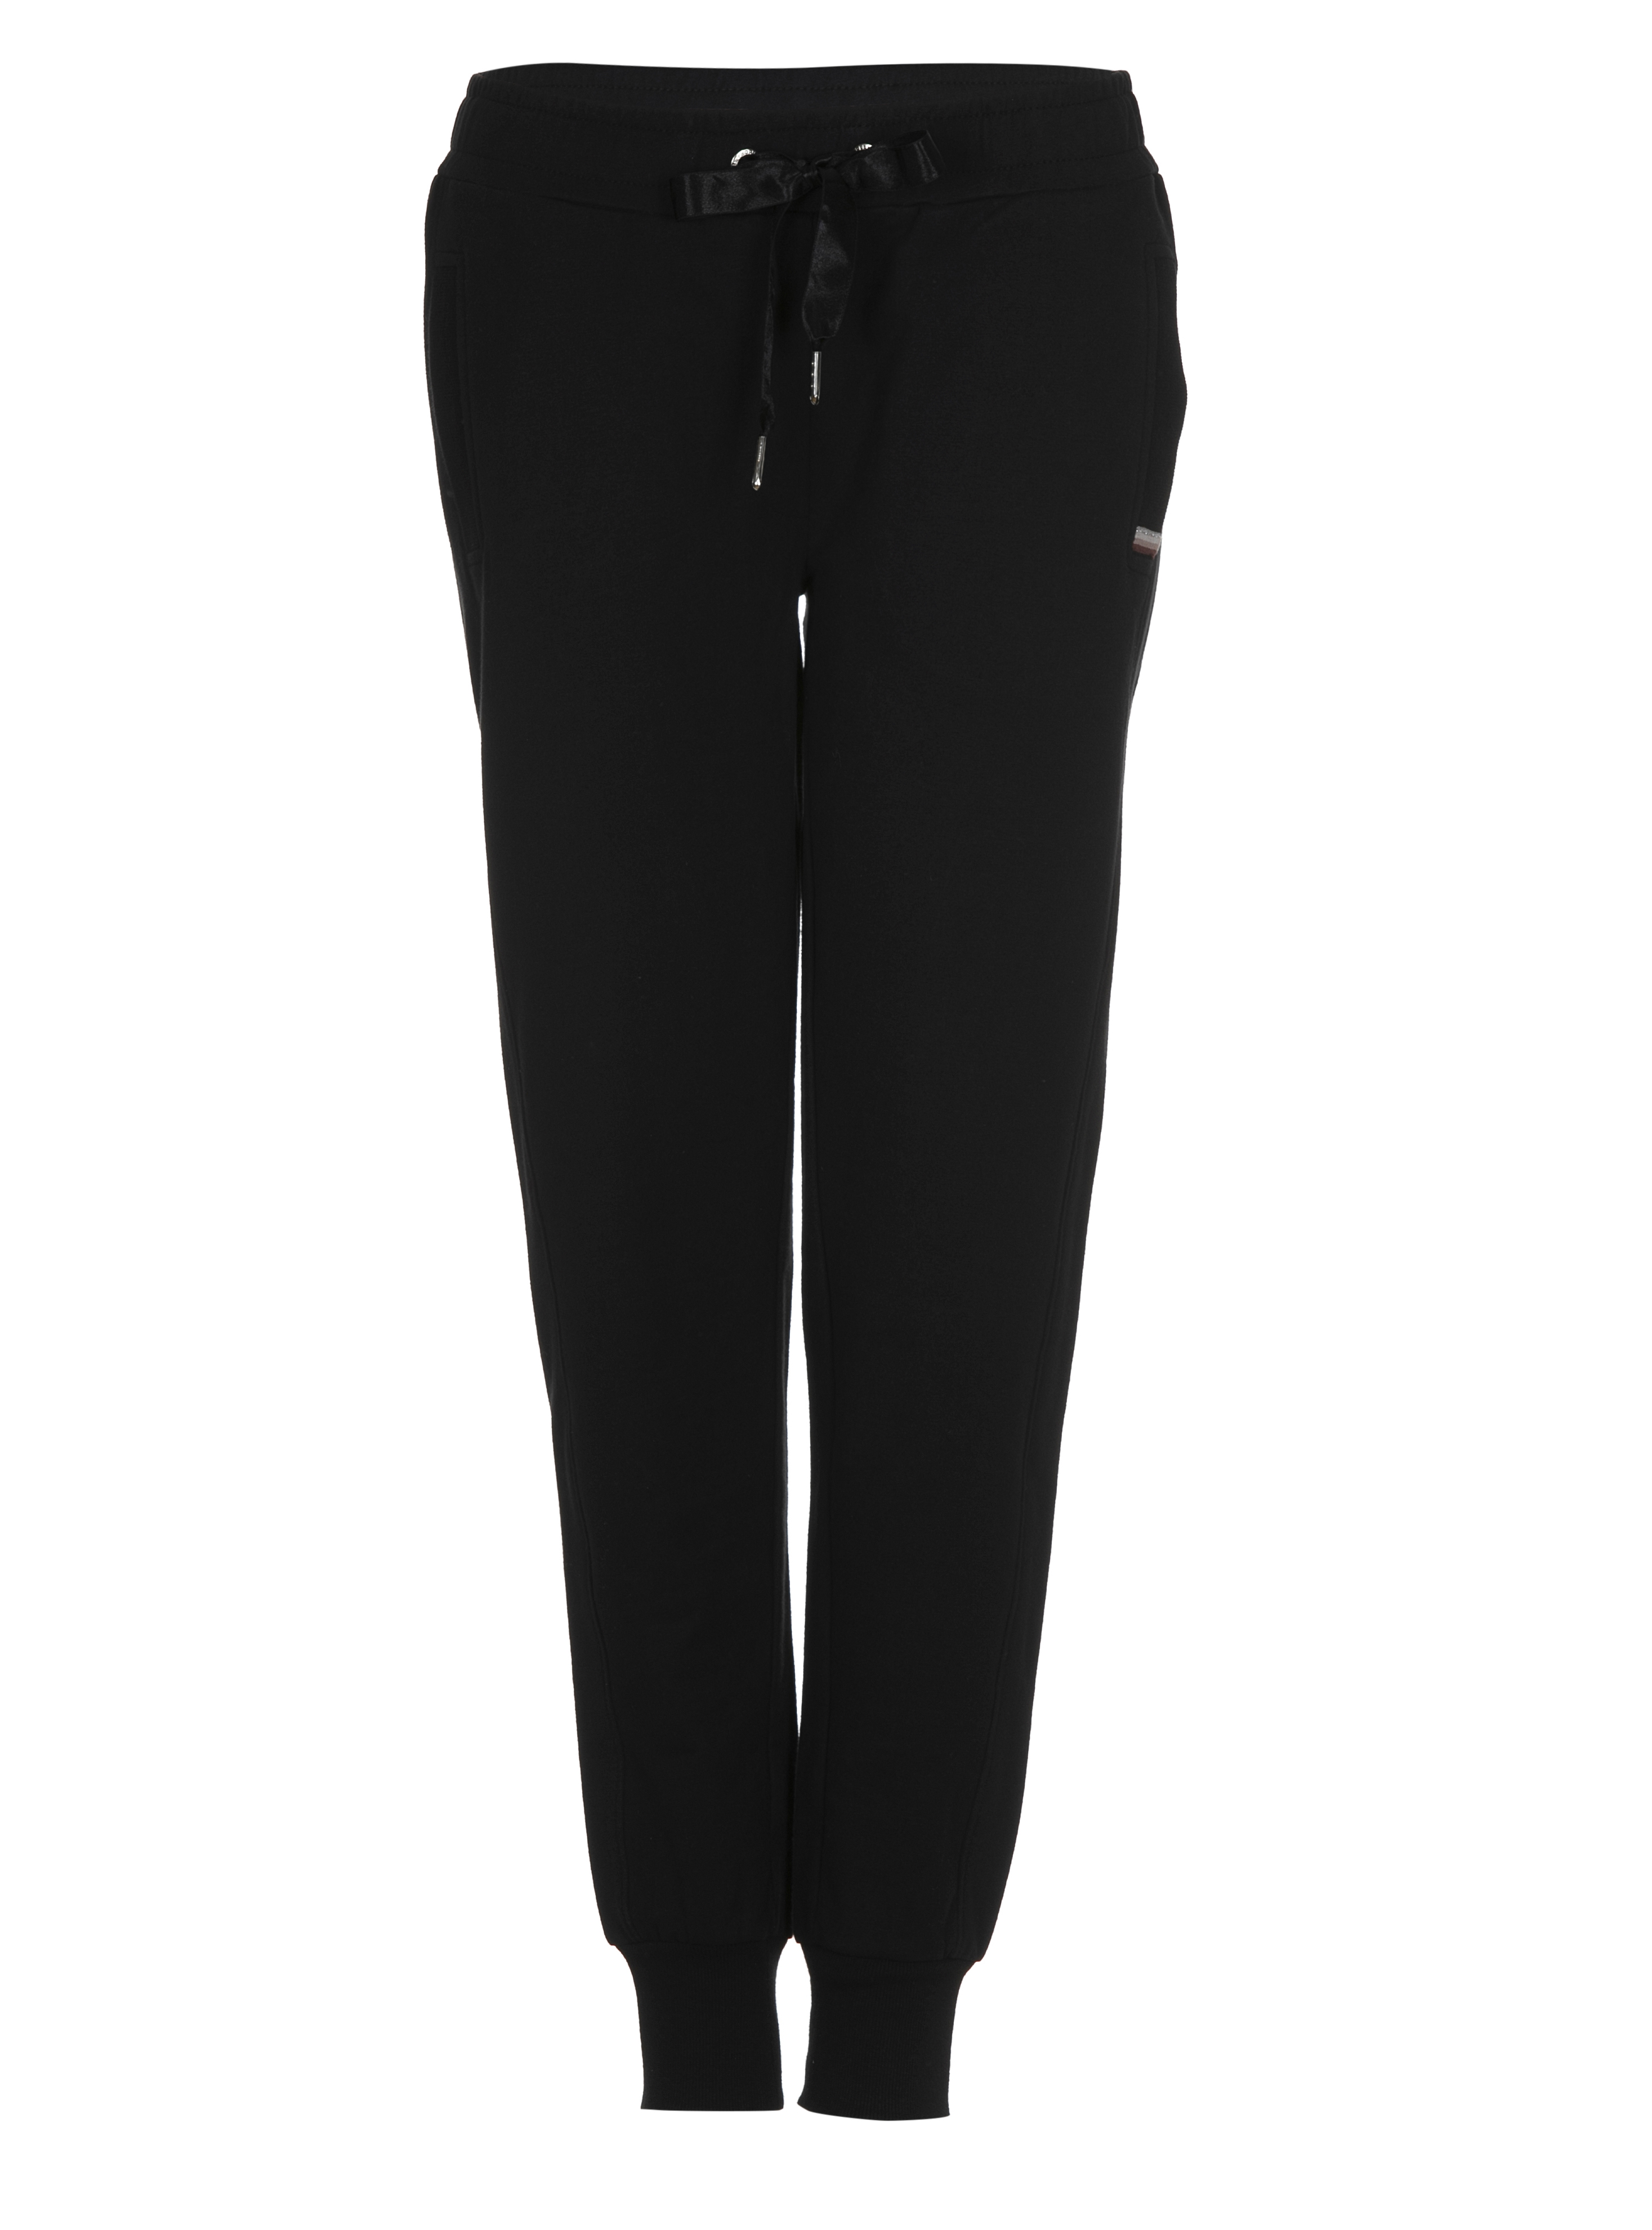 Pantalone Marx 4.799 rsd